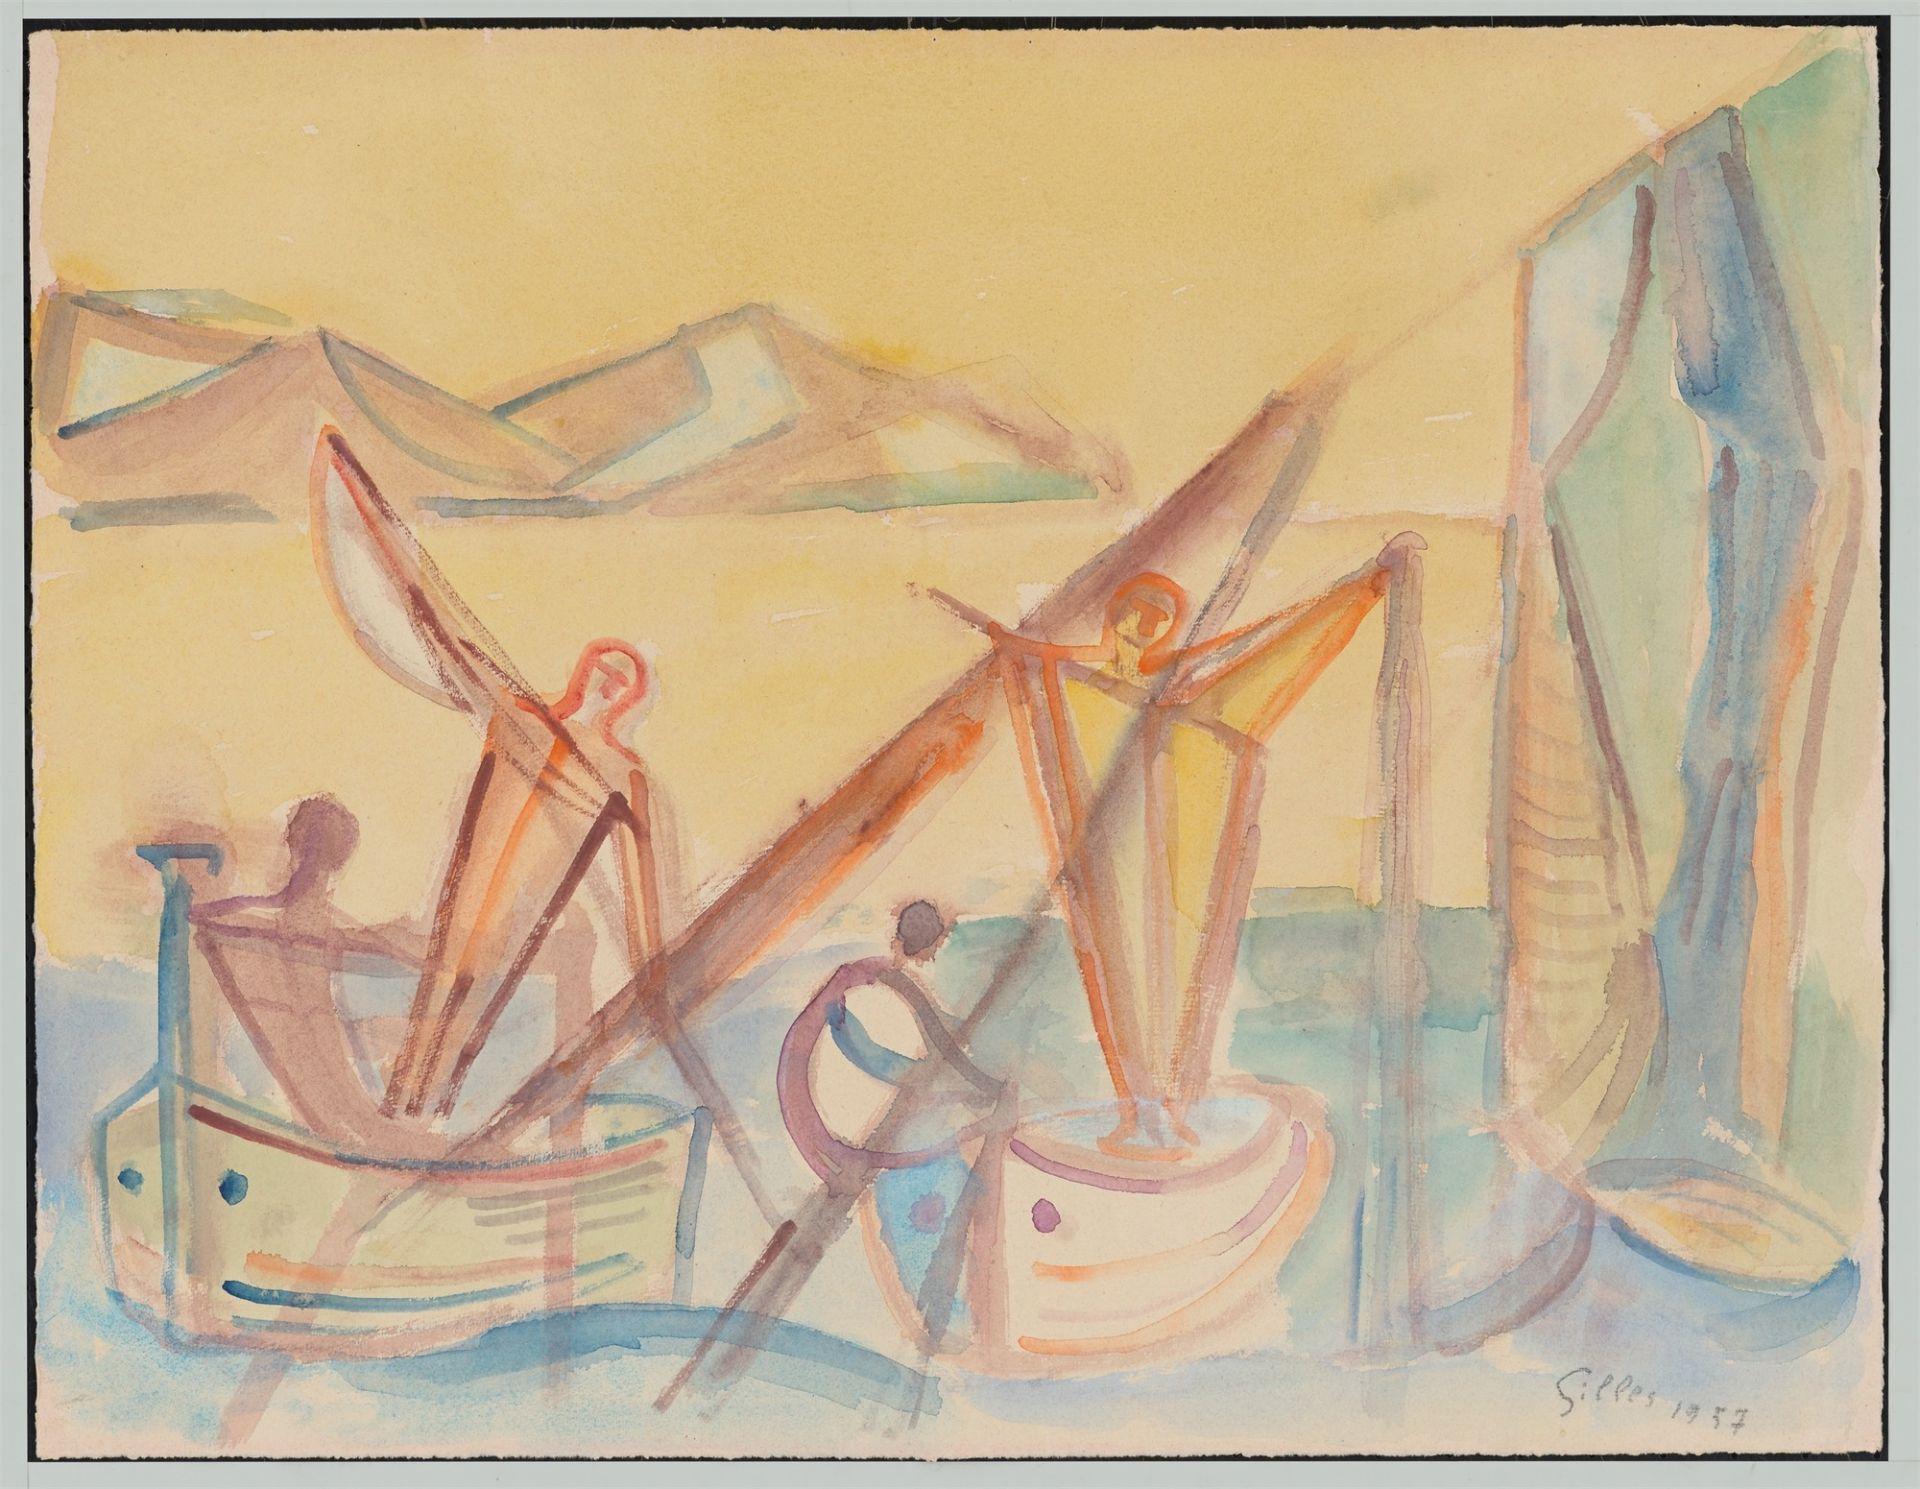 Werner Gilles. In the boat. 1957 - Image 2 of 4